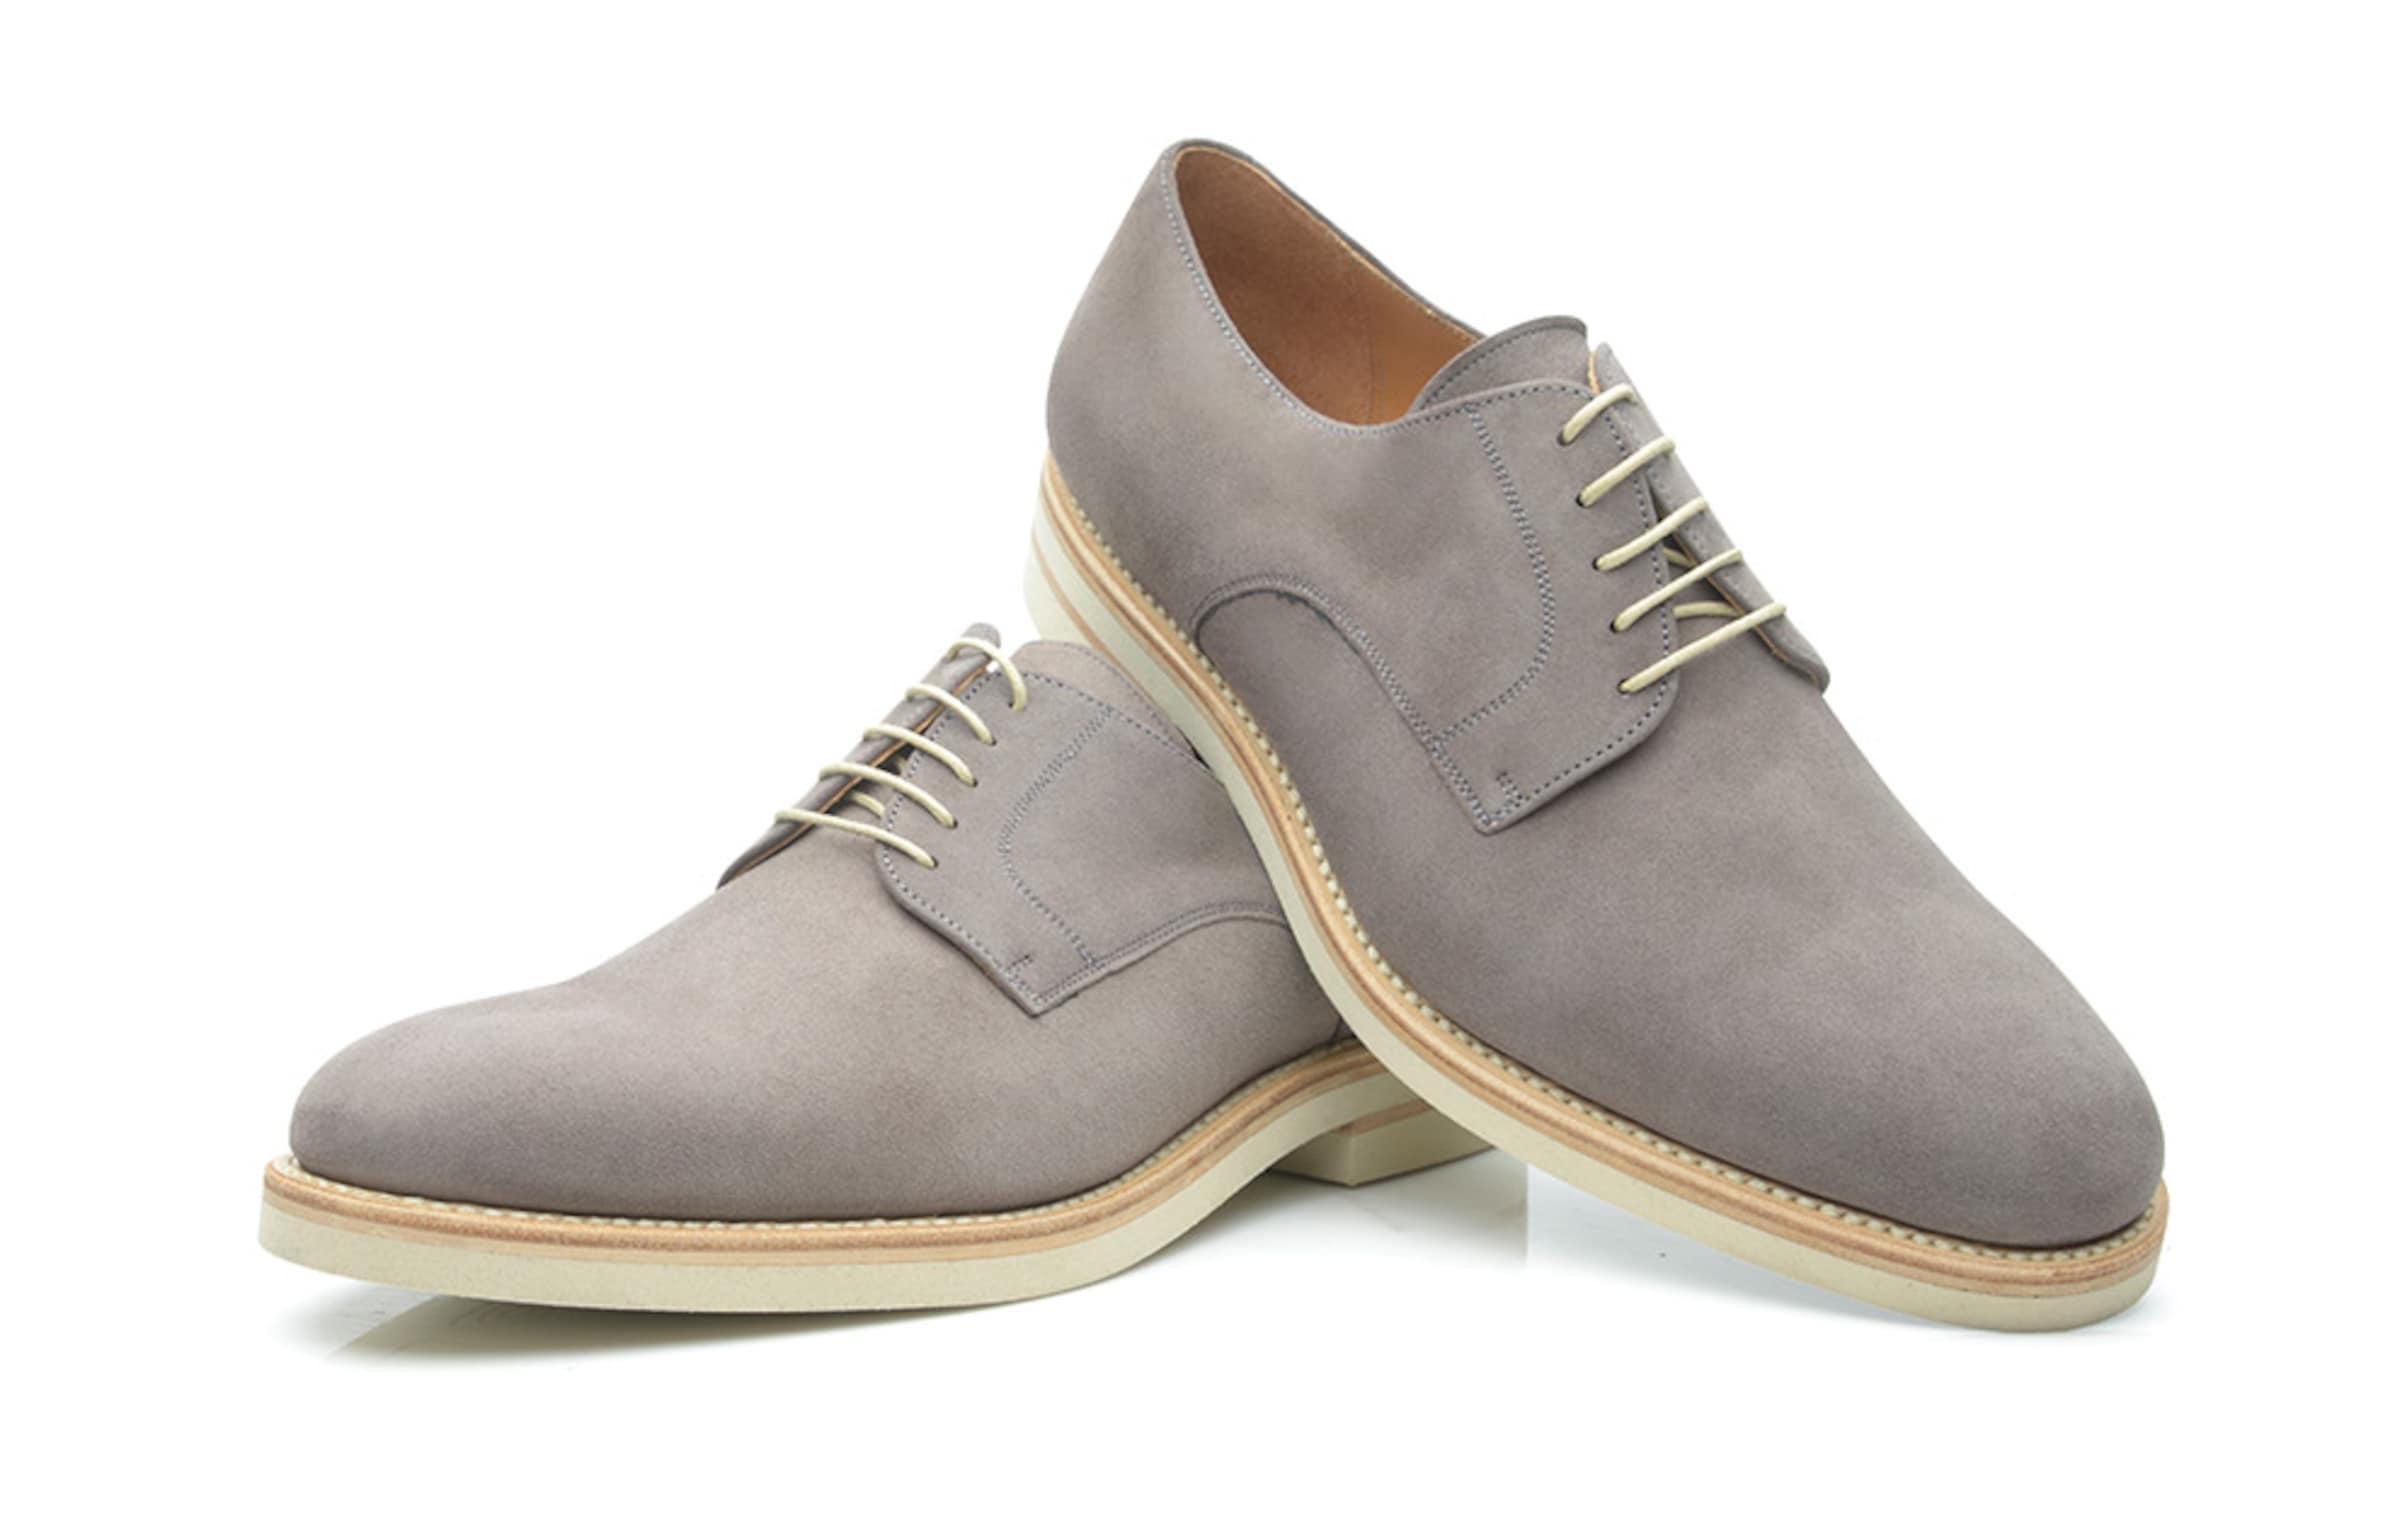 SchuhePASSION Halbschuhe Halbschuhe Halbschuhe 'No. 317 Leder Bequem, gut aussehend 56b391